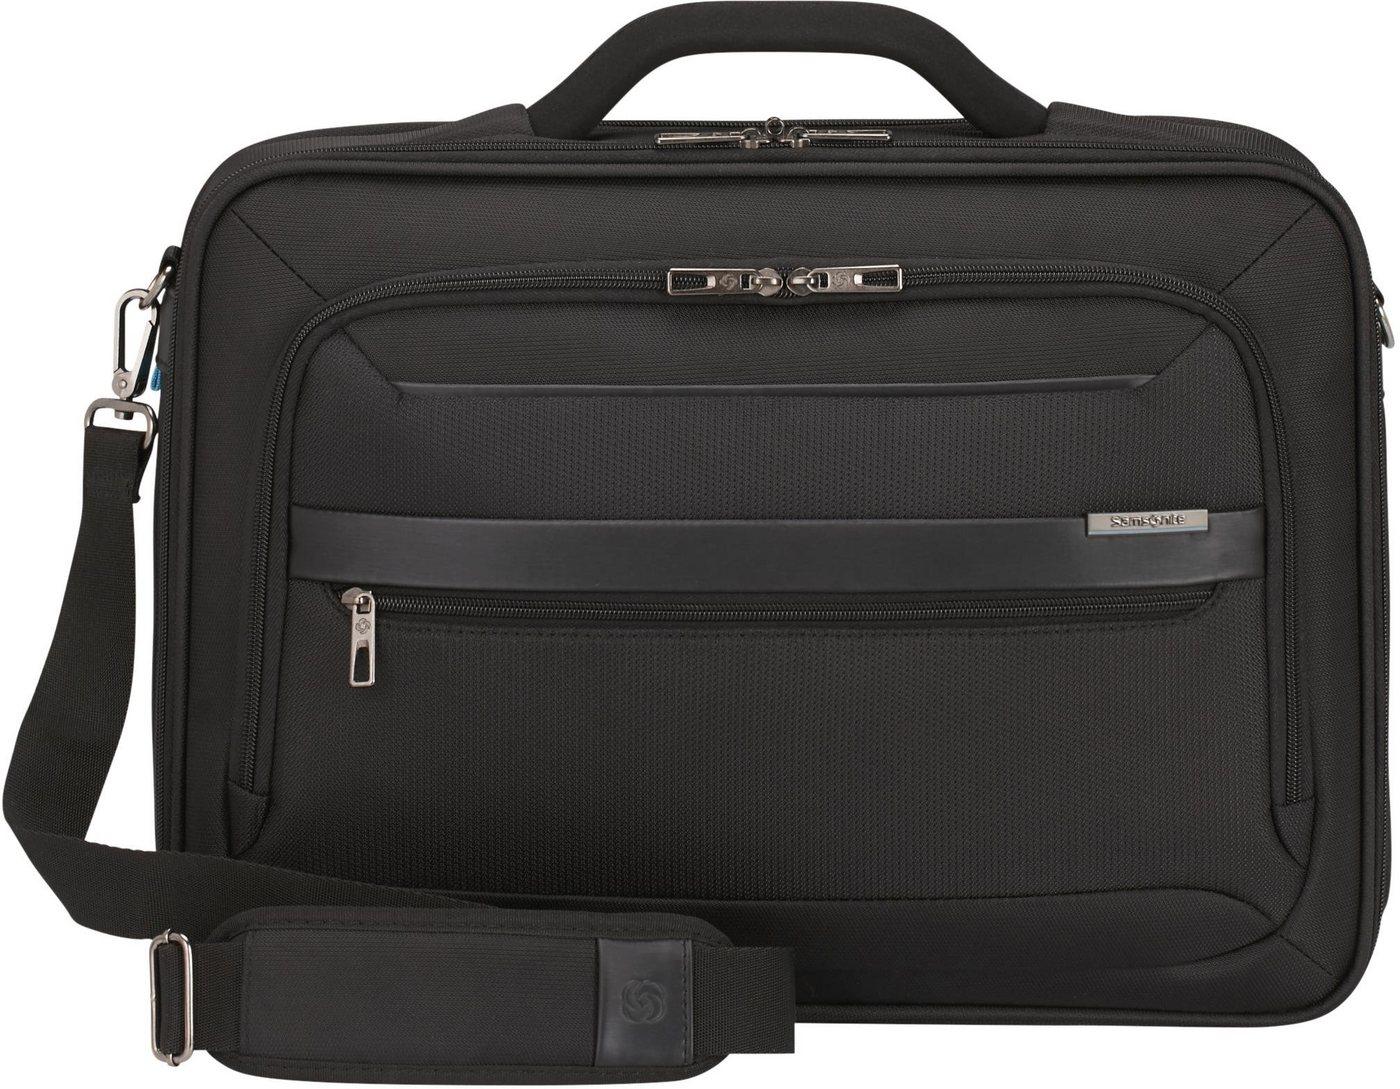 samsonite -  Laptoptasche »Vectura Evo Office Case 17,3, black«